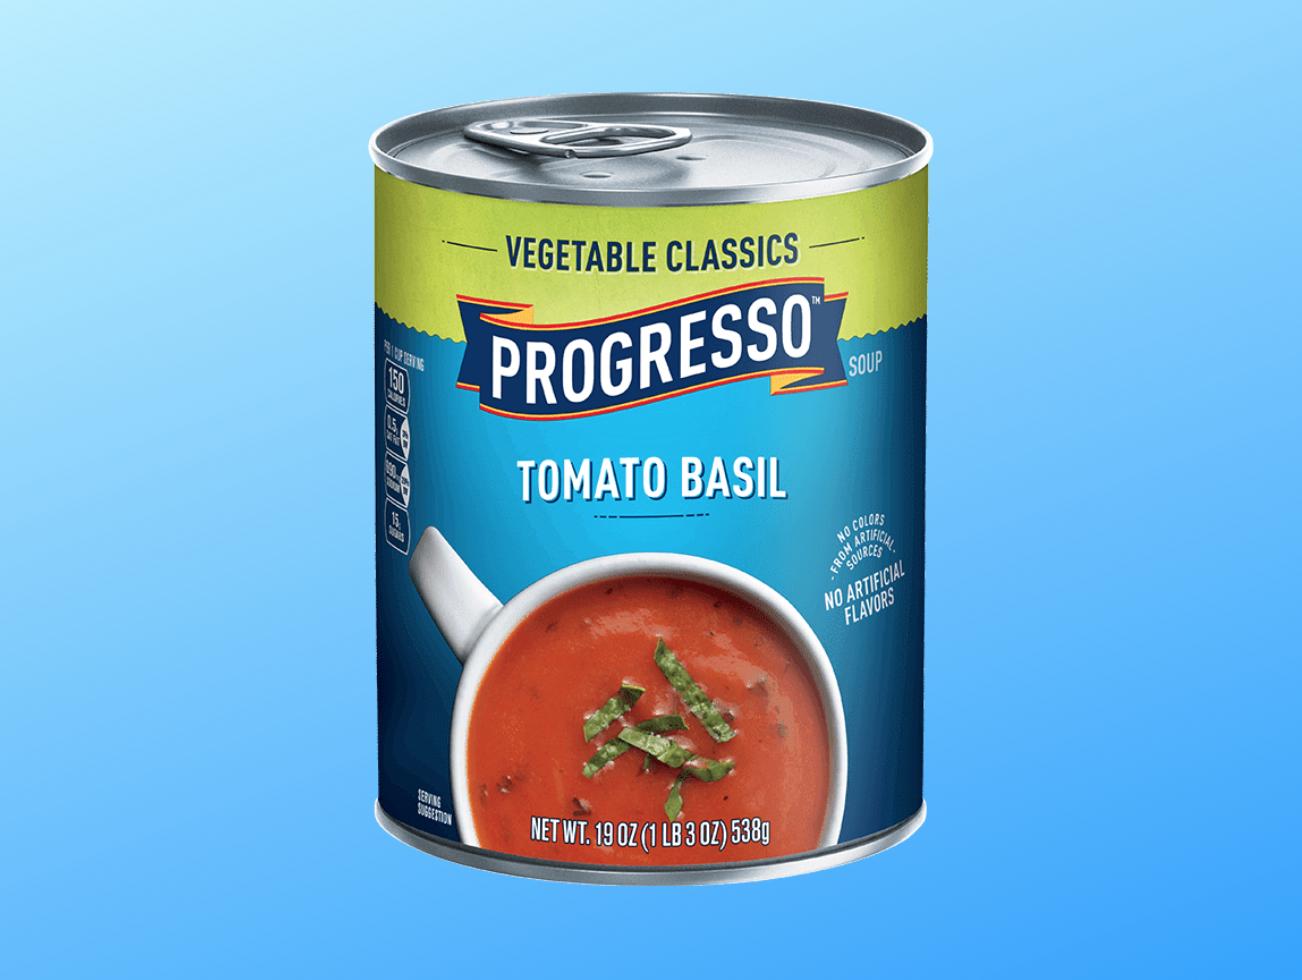 Progresso Tomato Basil